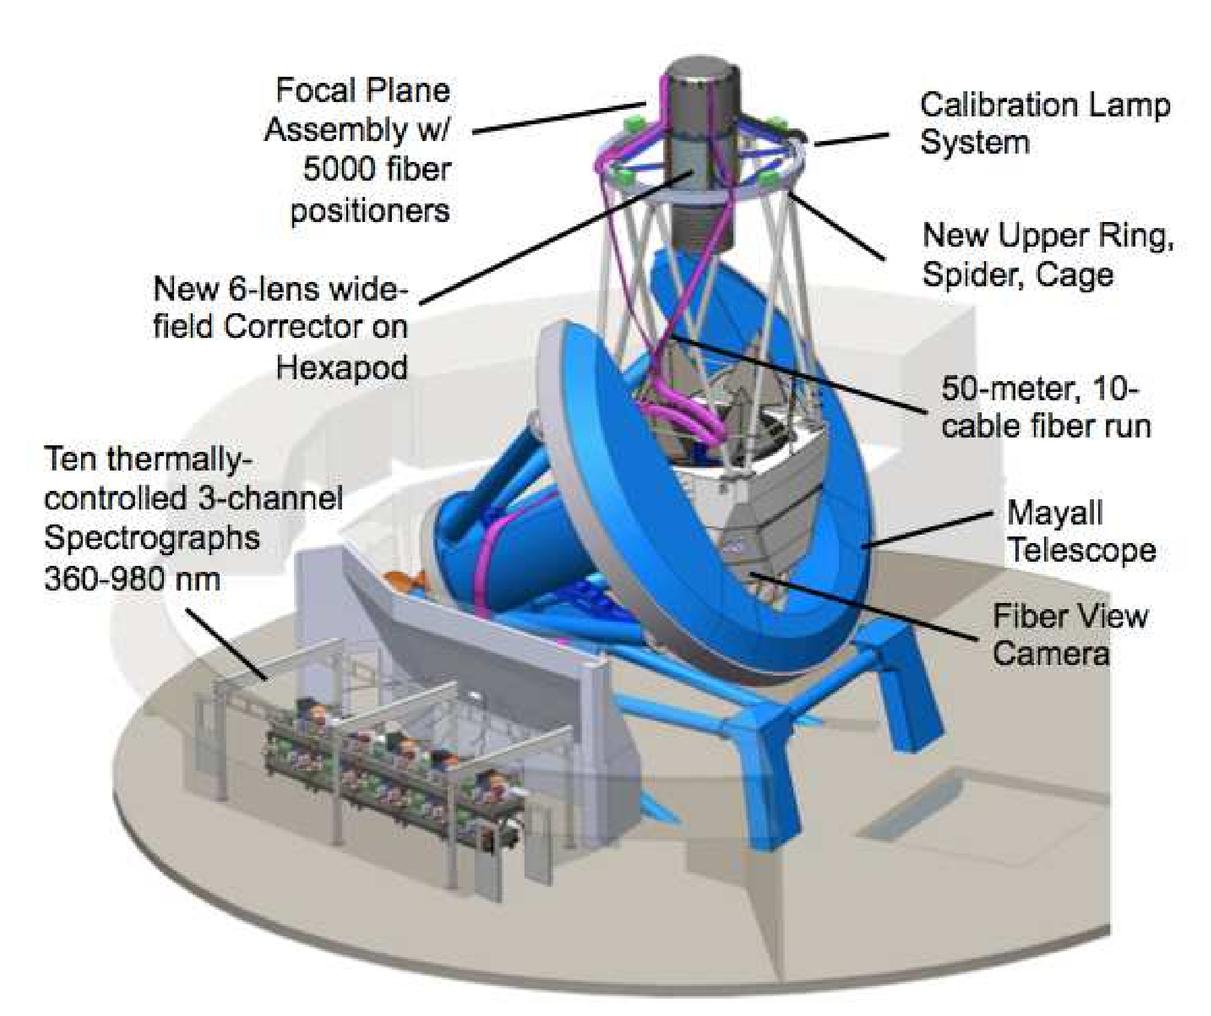 Overview of the Dark Energy Spectroscopic Instrument